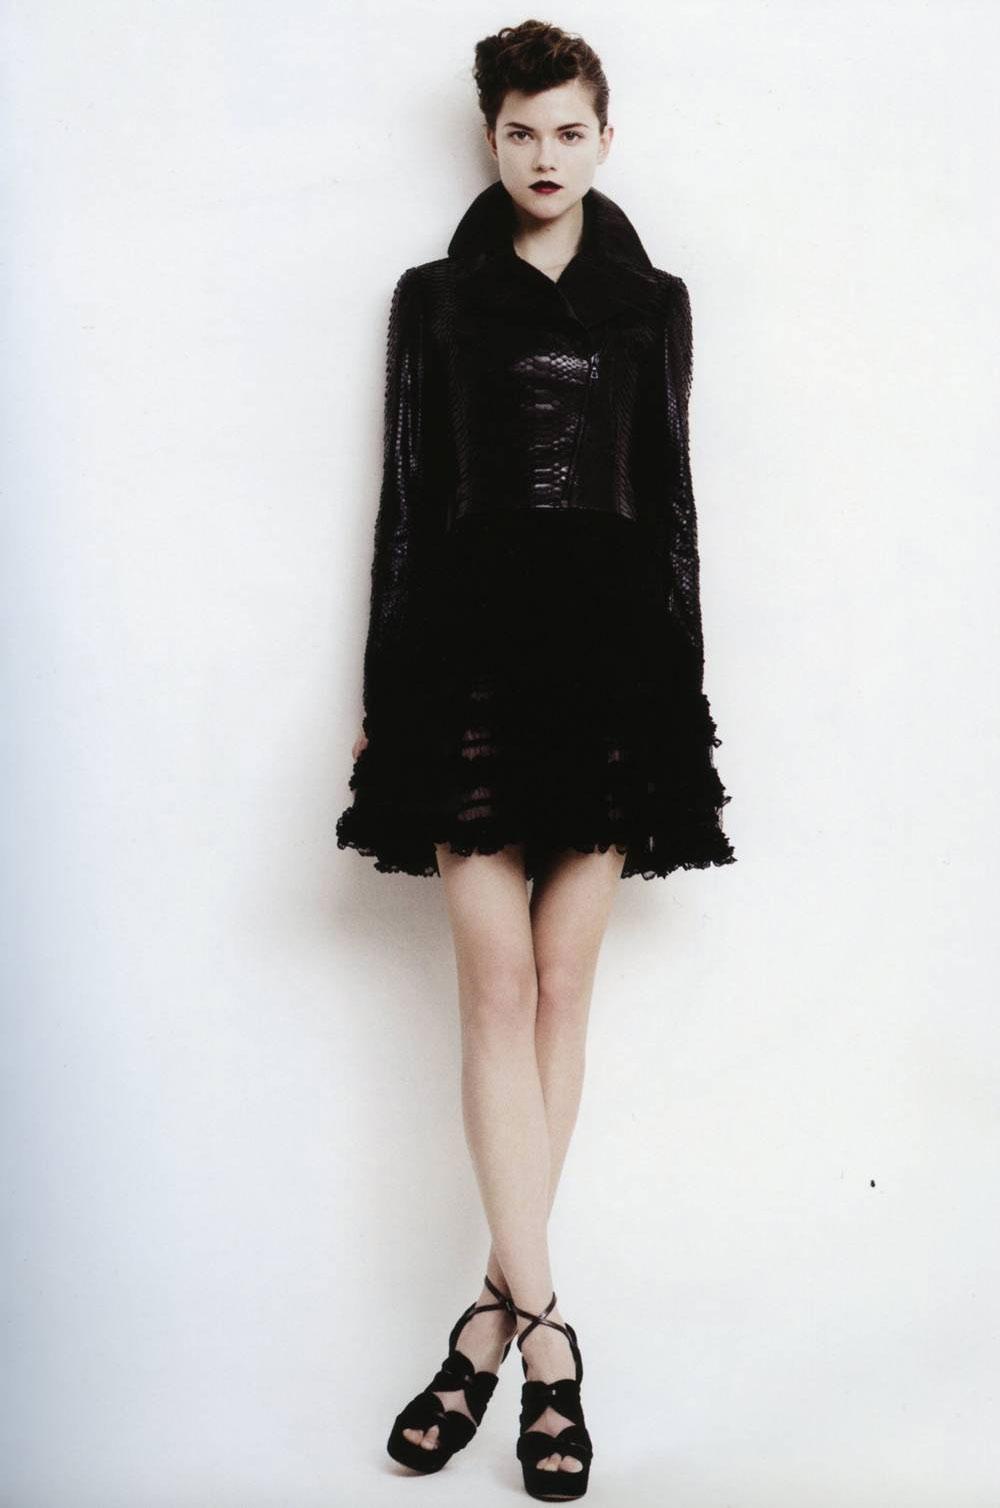 Azzedine Alaia spring 2009 lookbook photo Willy Vanderperre stylist Joe McKenna model Kasia Struss Women Management New York Blog 4